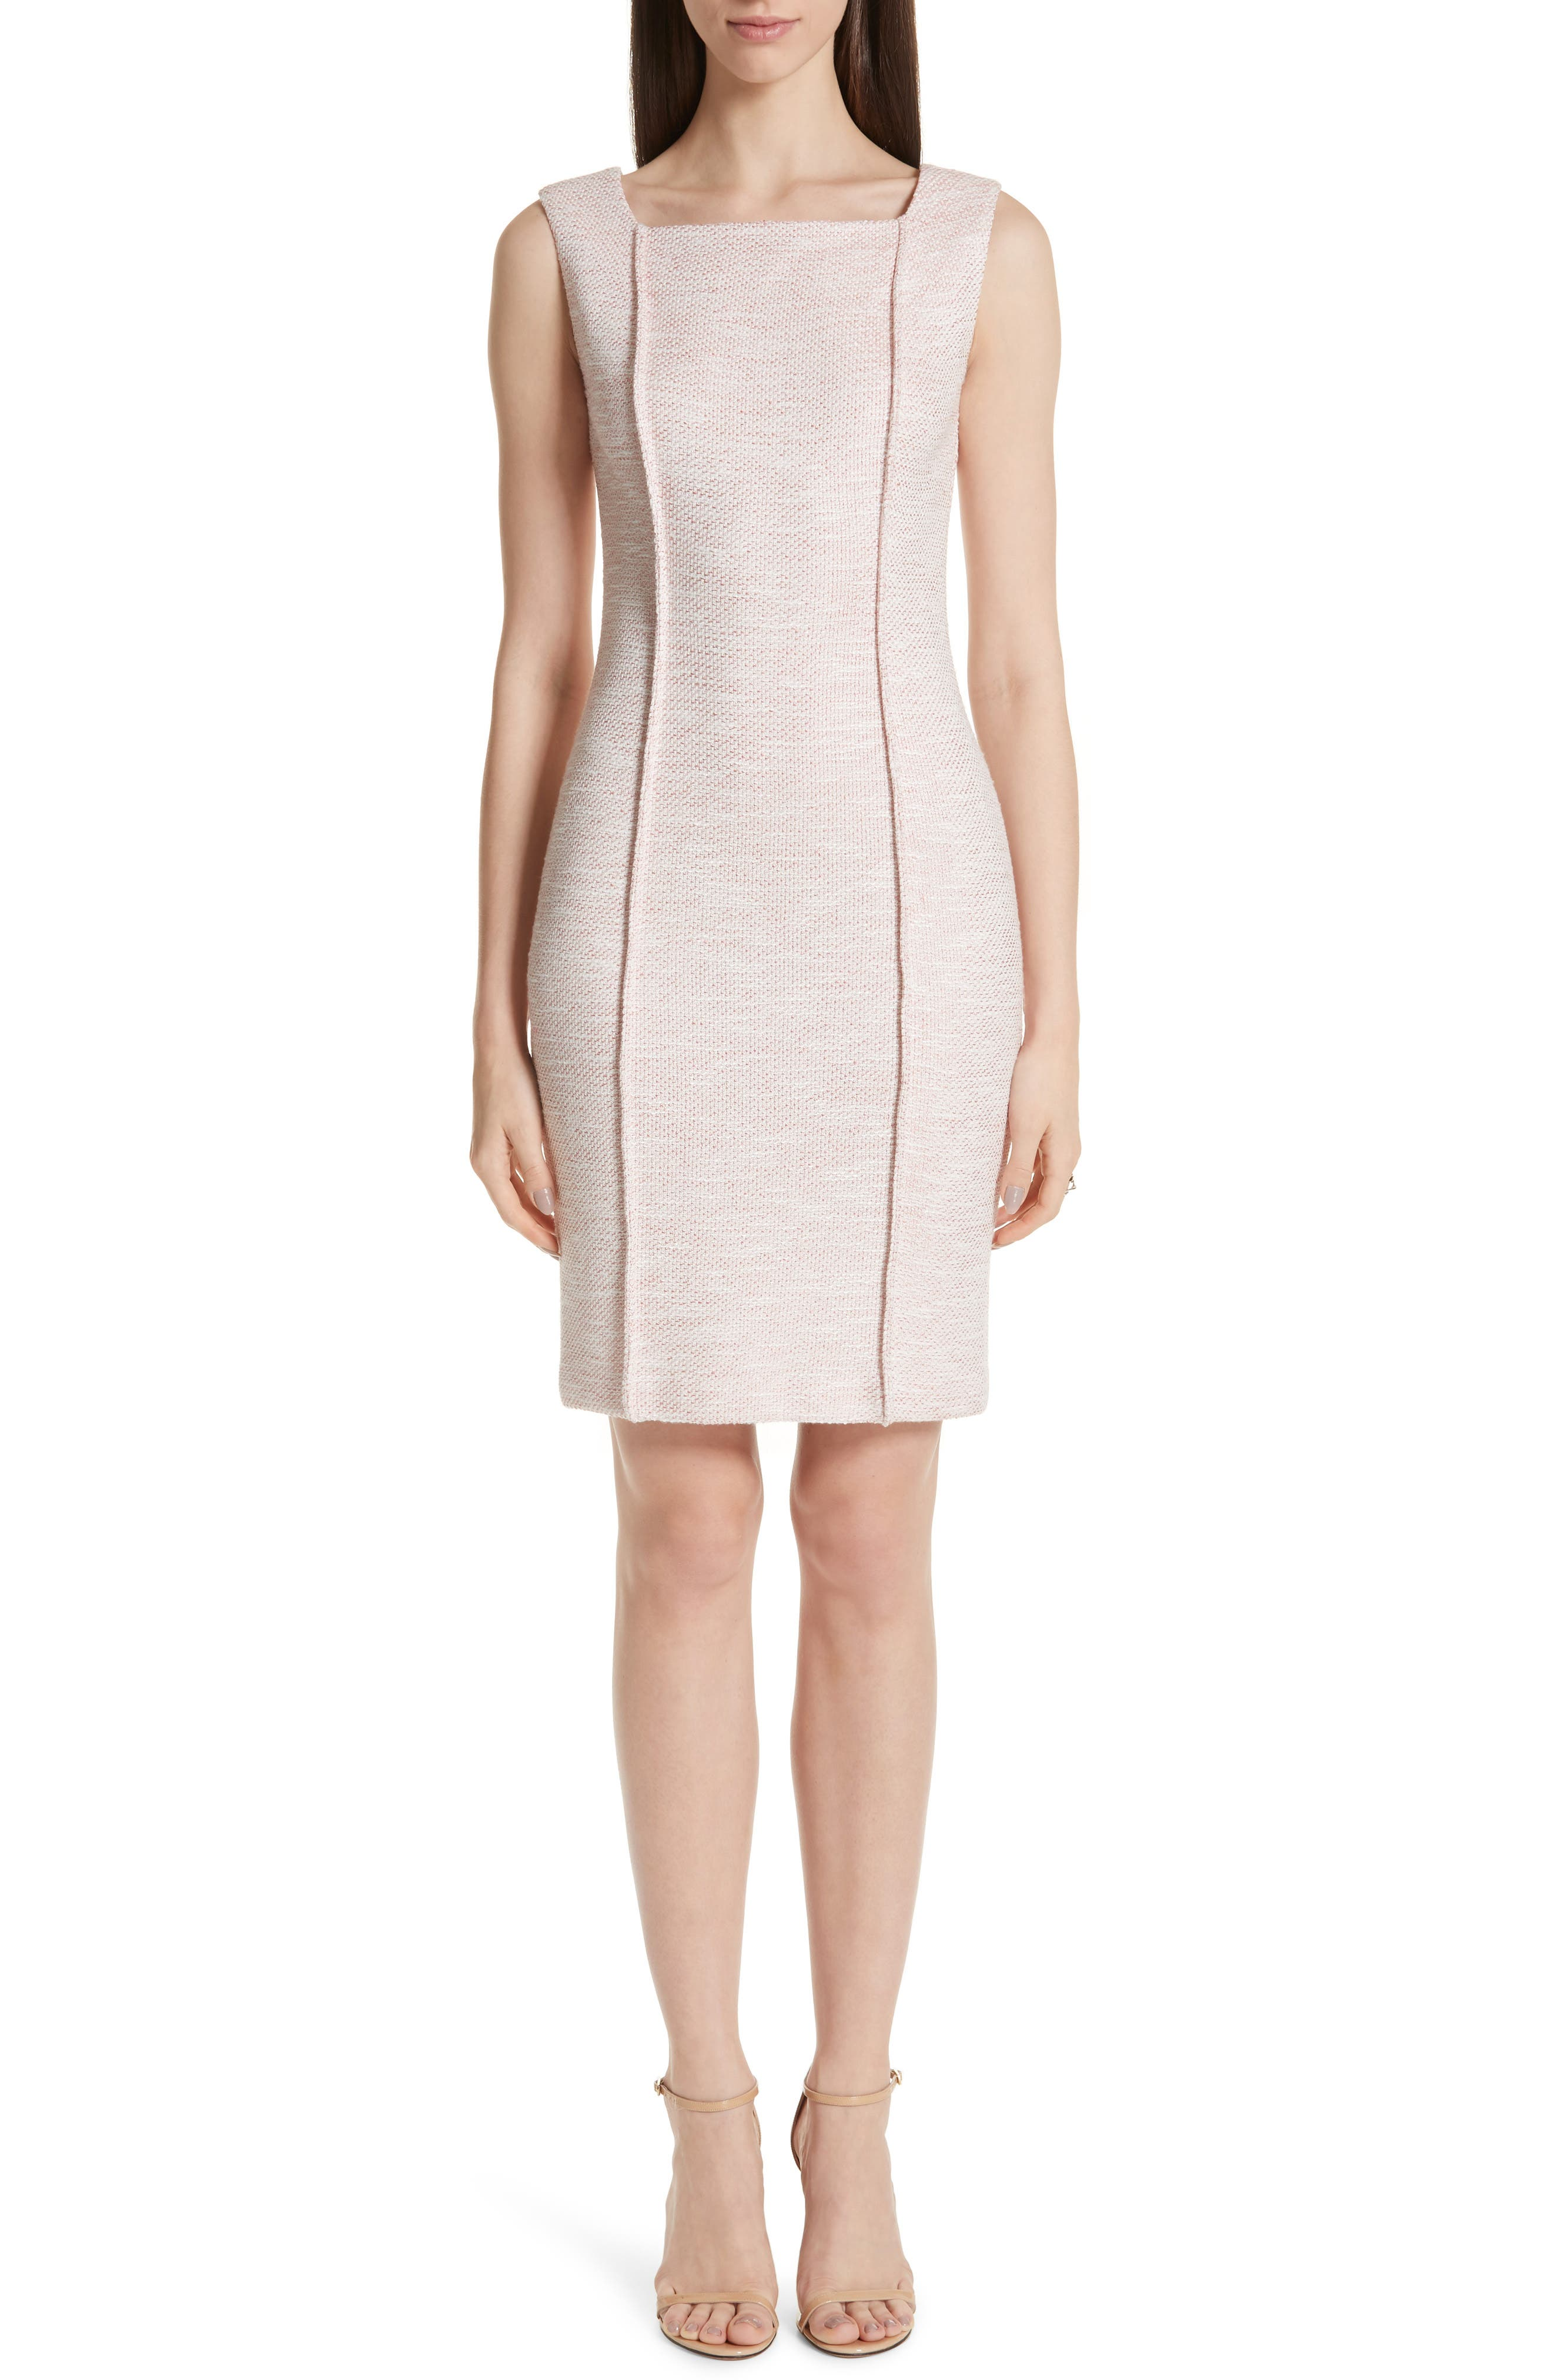 St. John Collection Belinda Knit Square Neck Dress, White